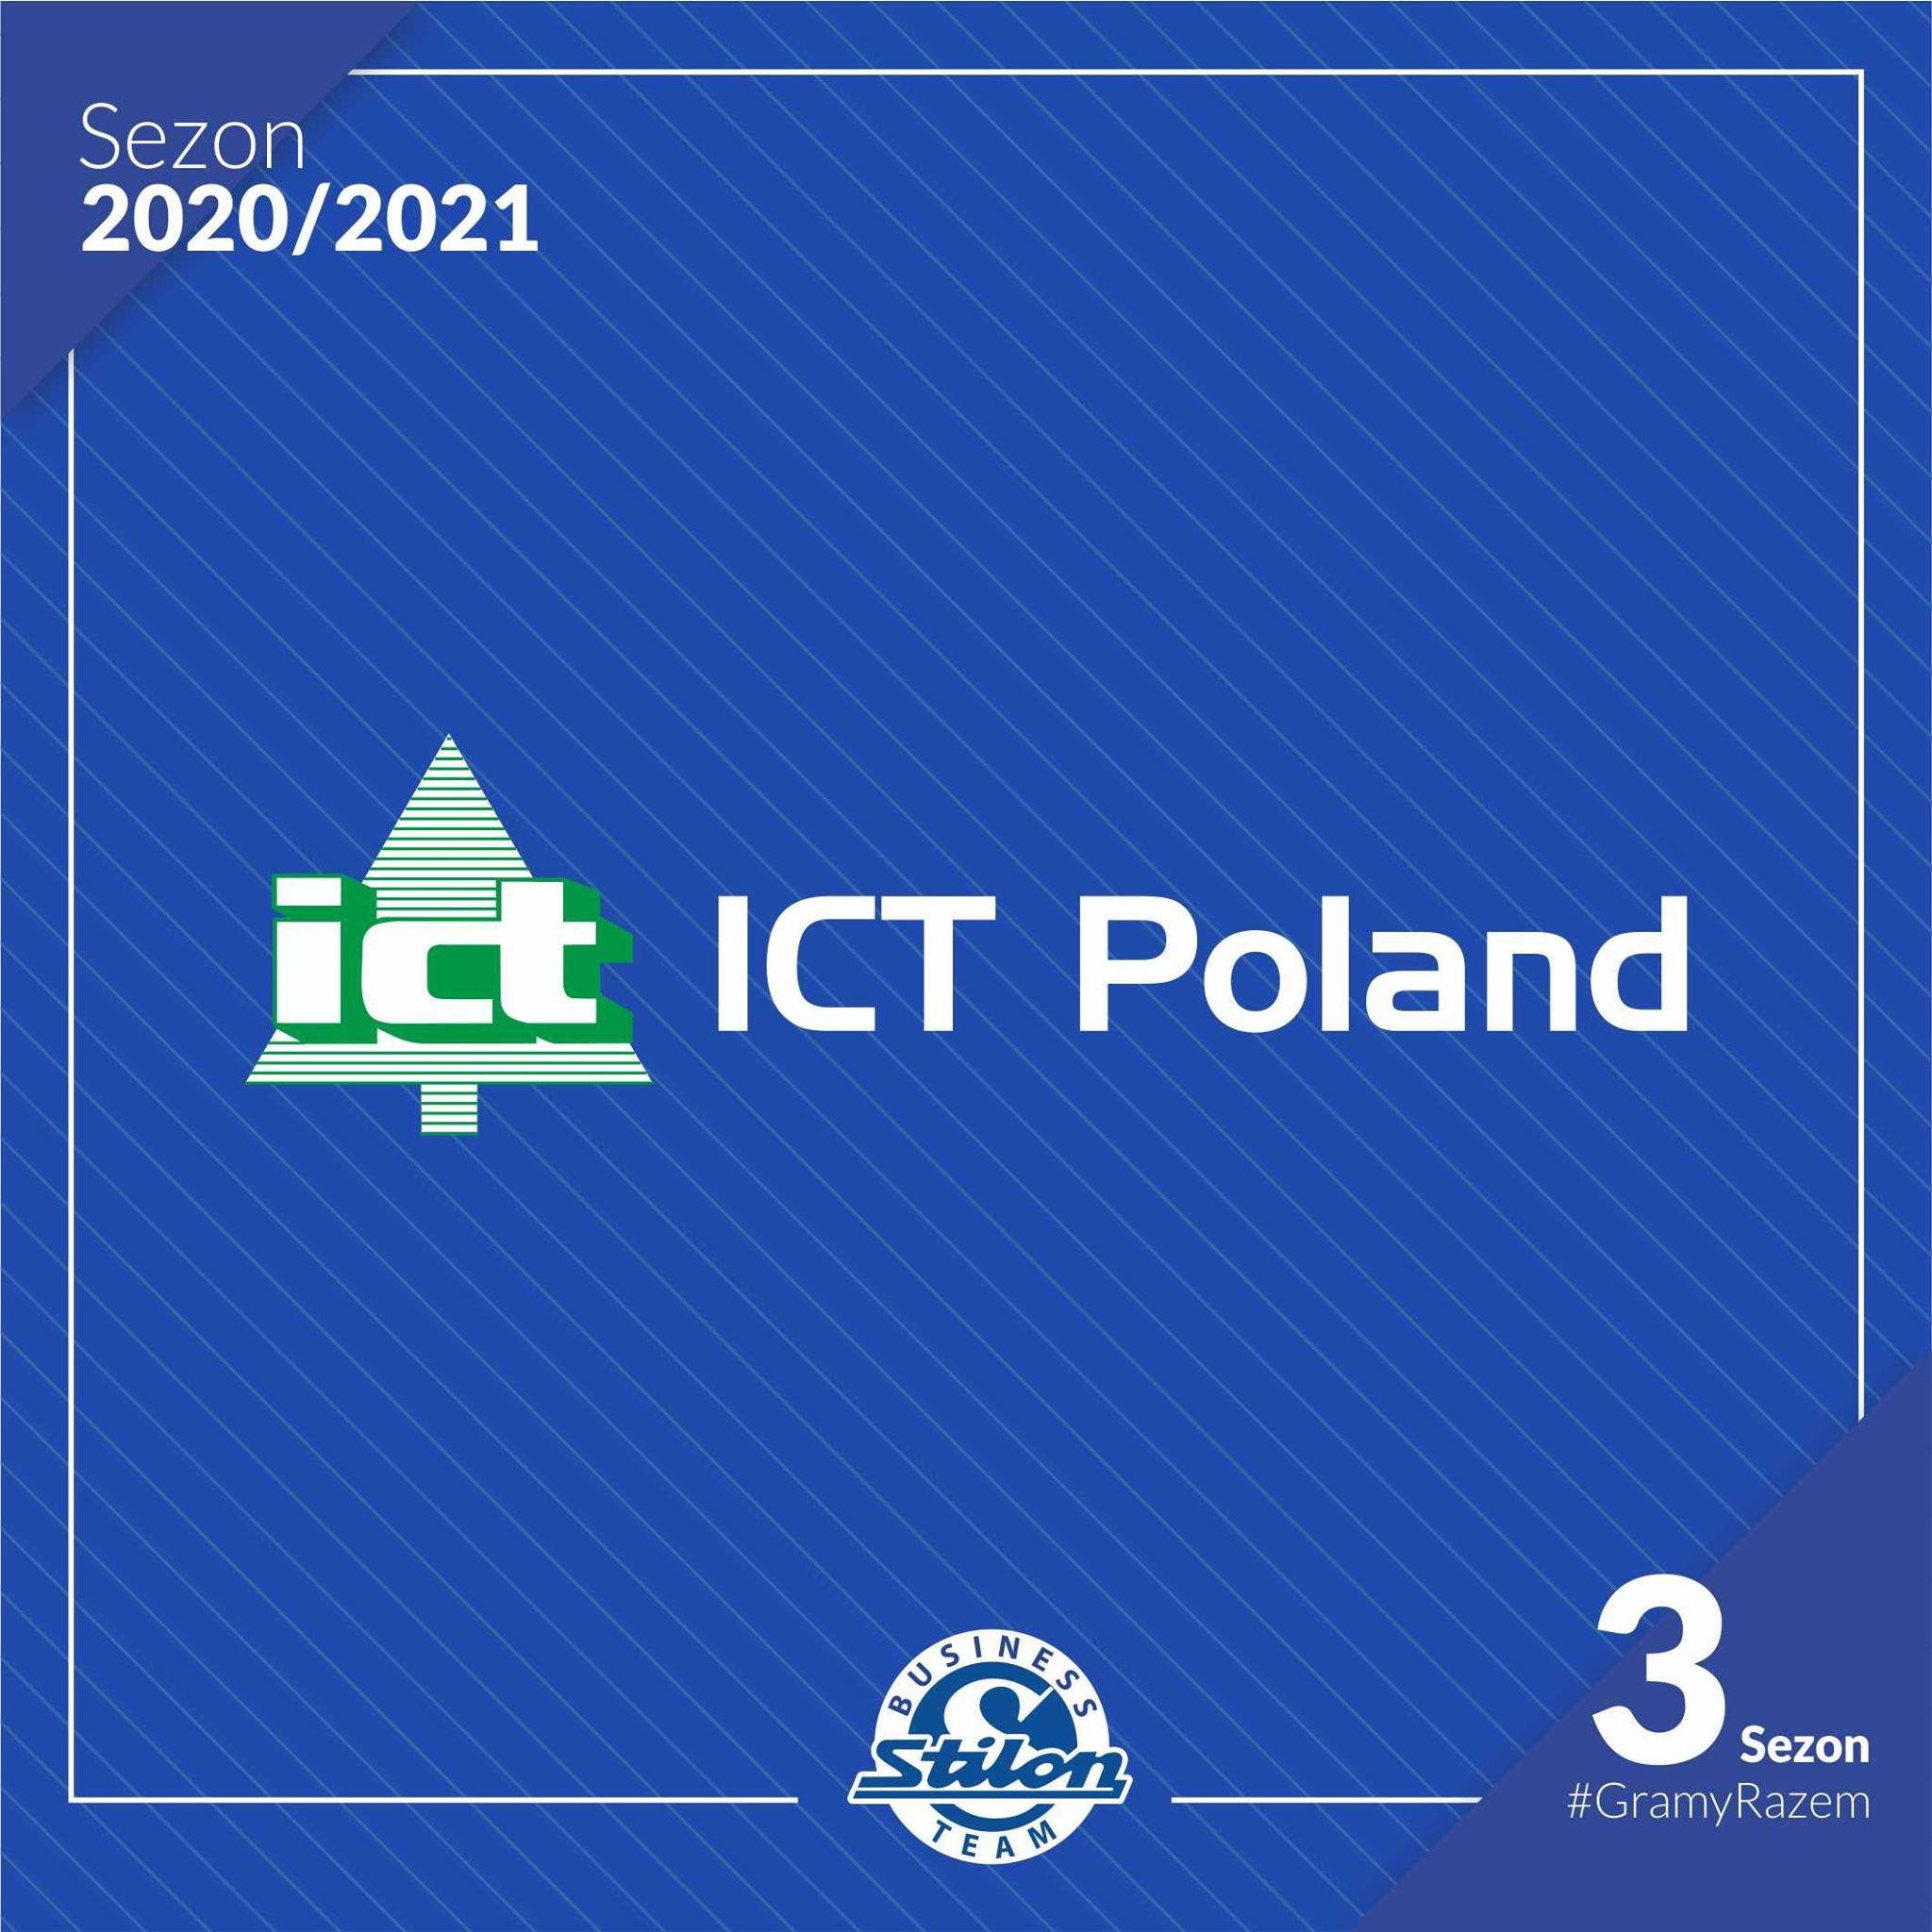 https://stilon.gorzow.pl/wp-content/uploads/2020/09/ICT.jpg